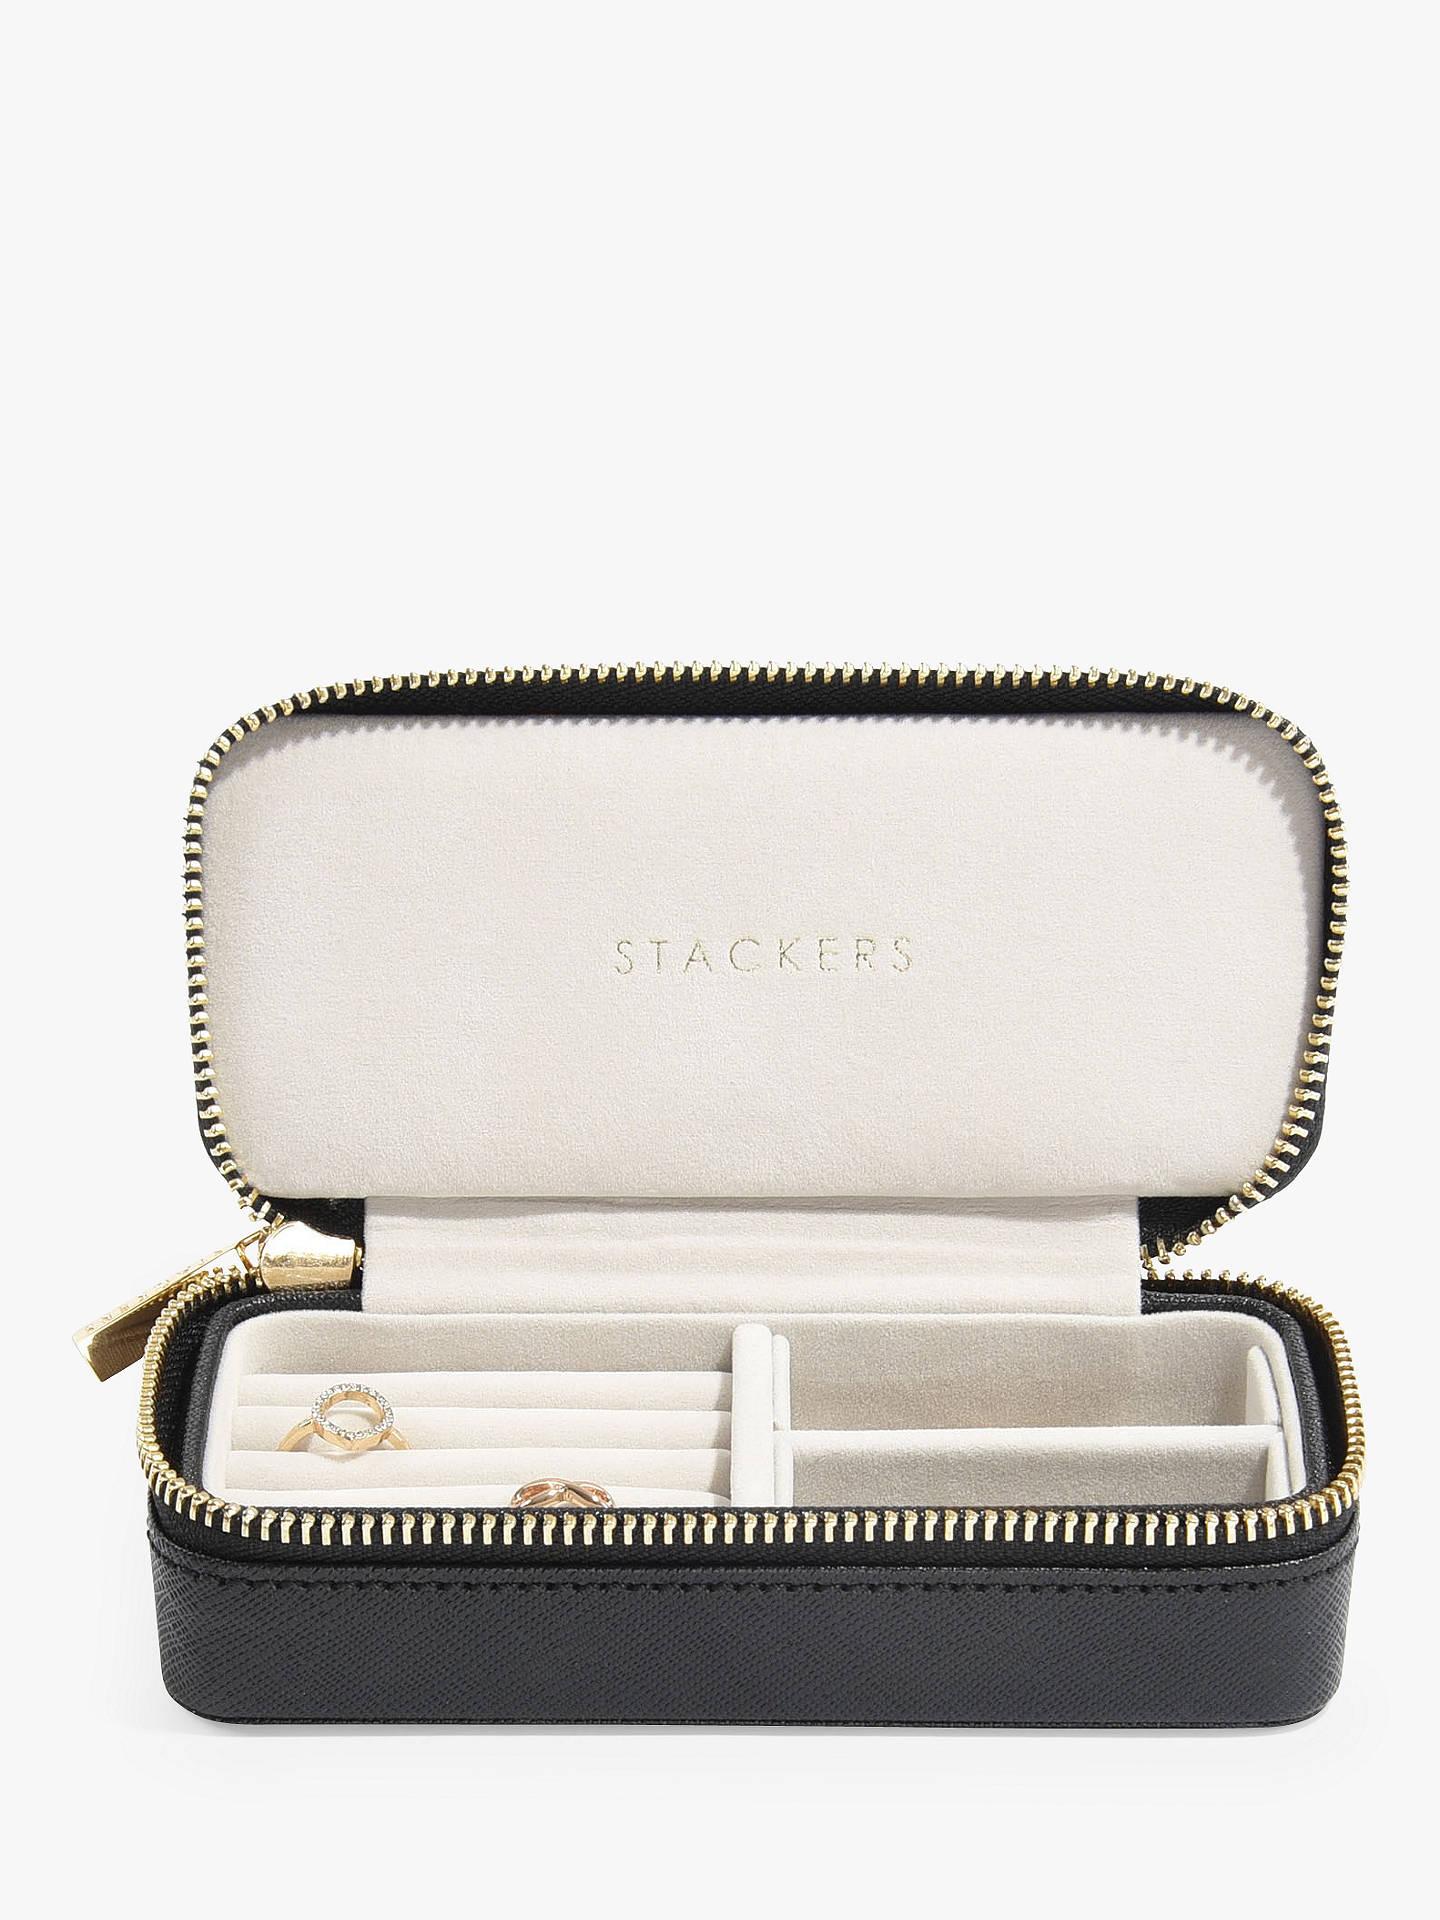 Stackers Overnight Travel Jewellery Box Black